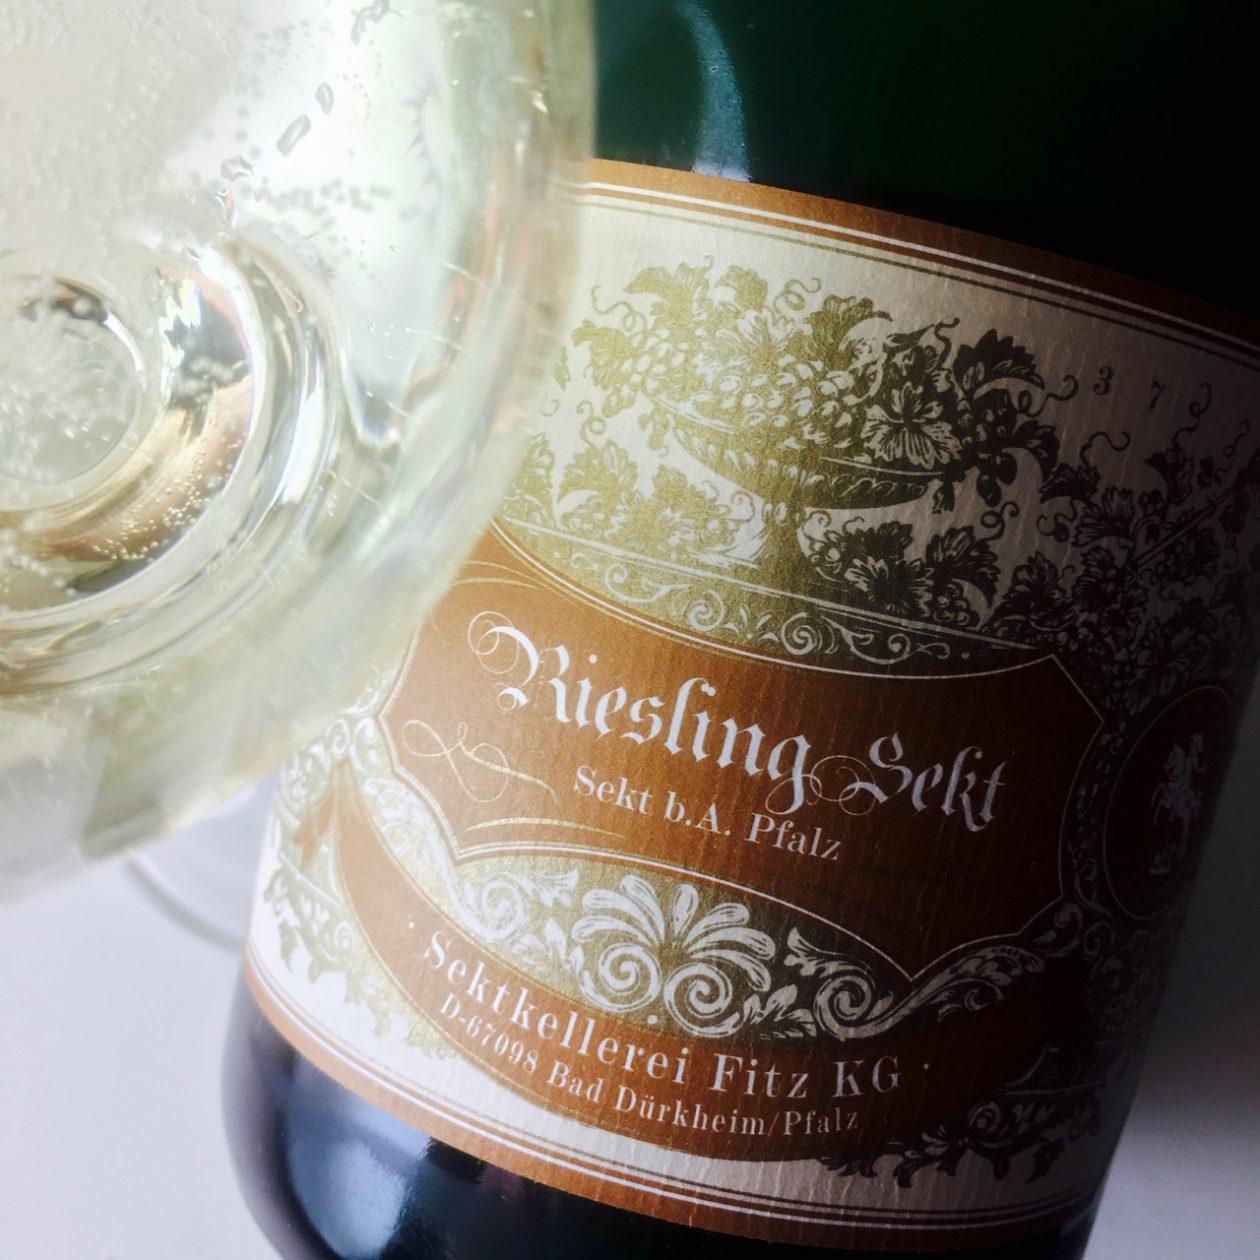 NV Fitz-Ritter Sekt Extra Trocken Pfalz